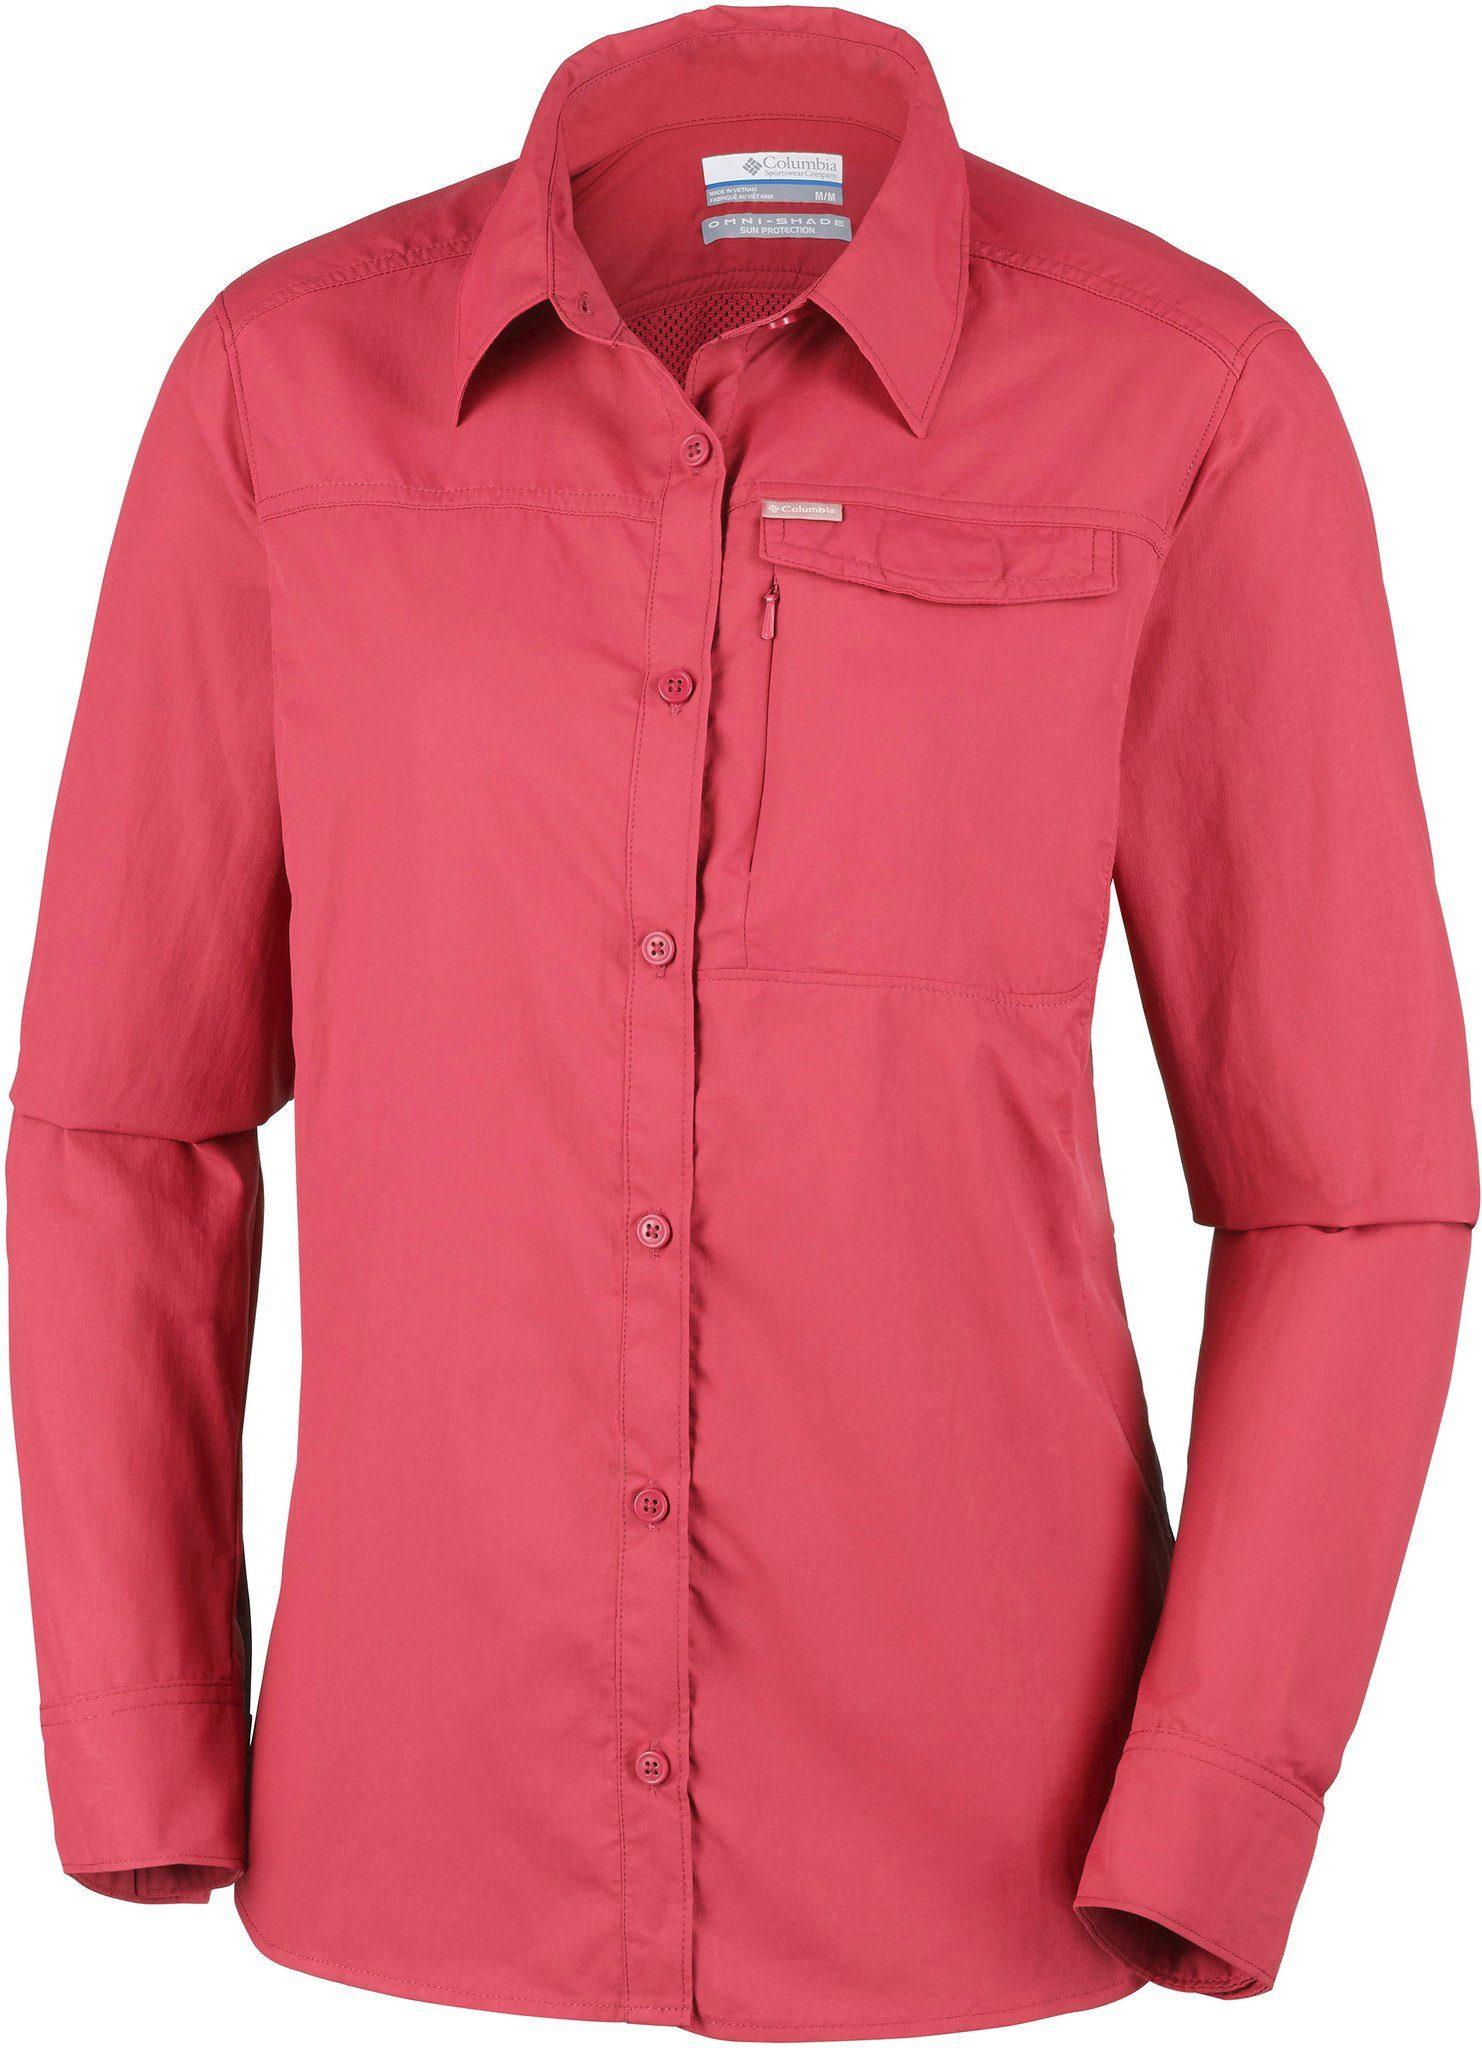 Columbia Bluse »Silver Ridge 2.0 Long Sleeve Shirt Women«